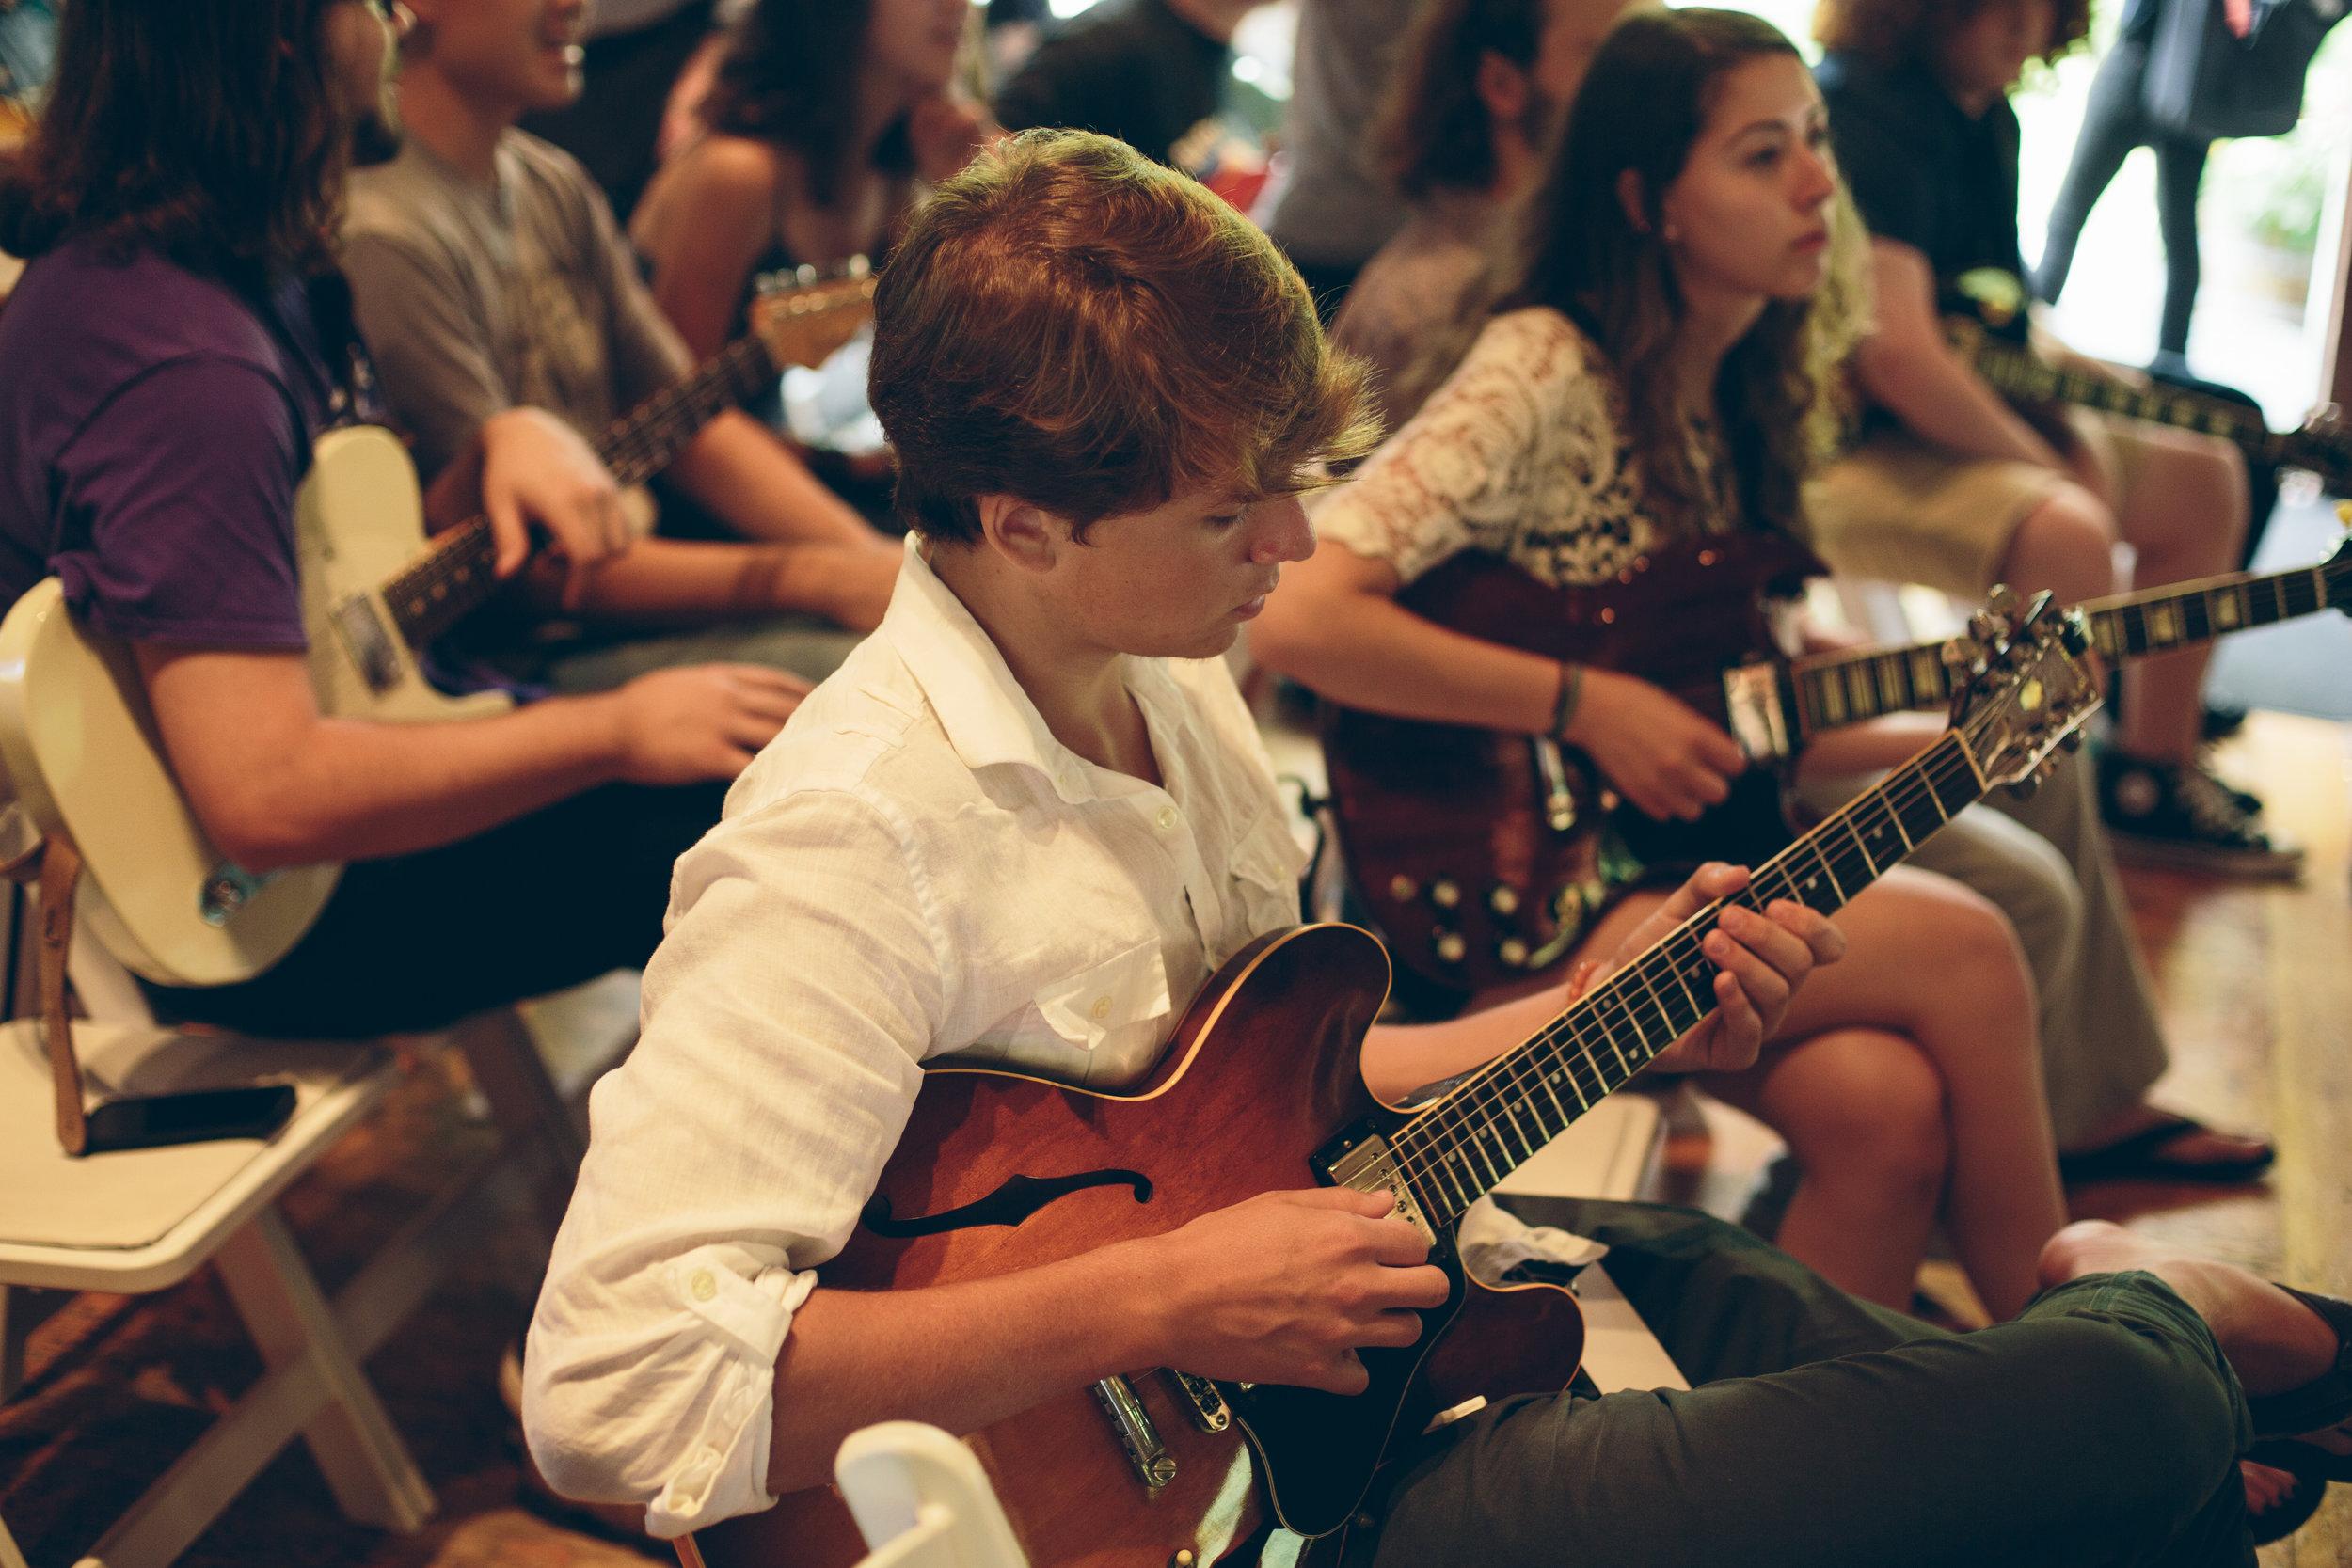 guitarworkshop-kids.jpg